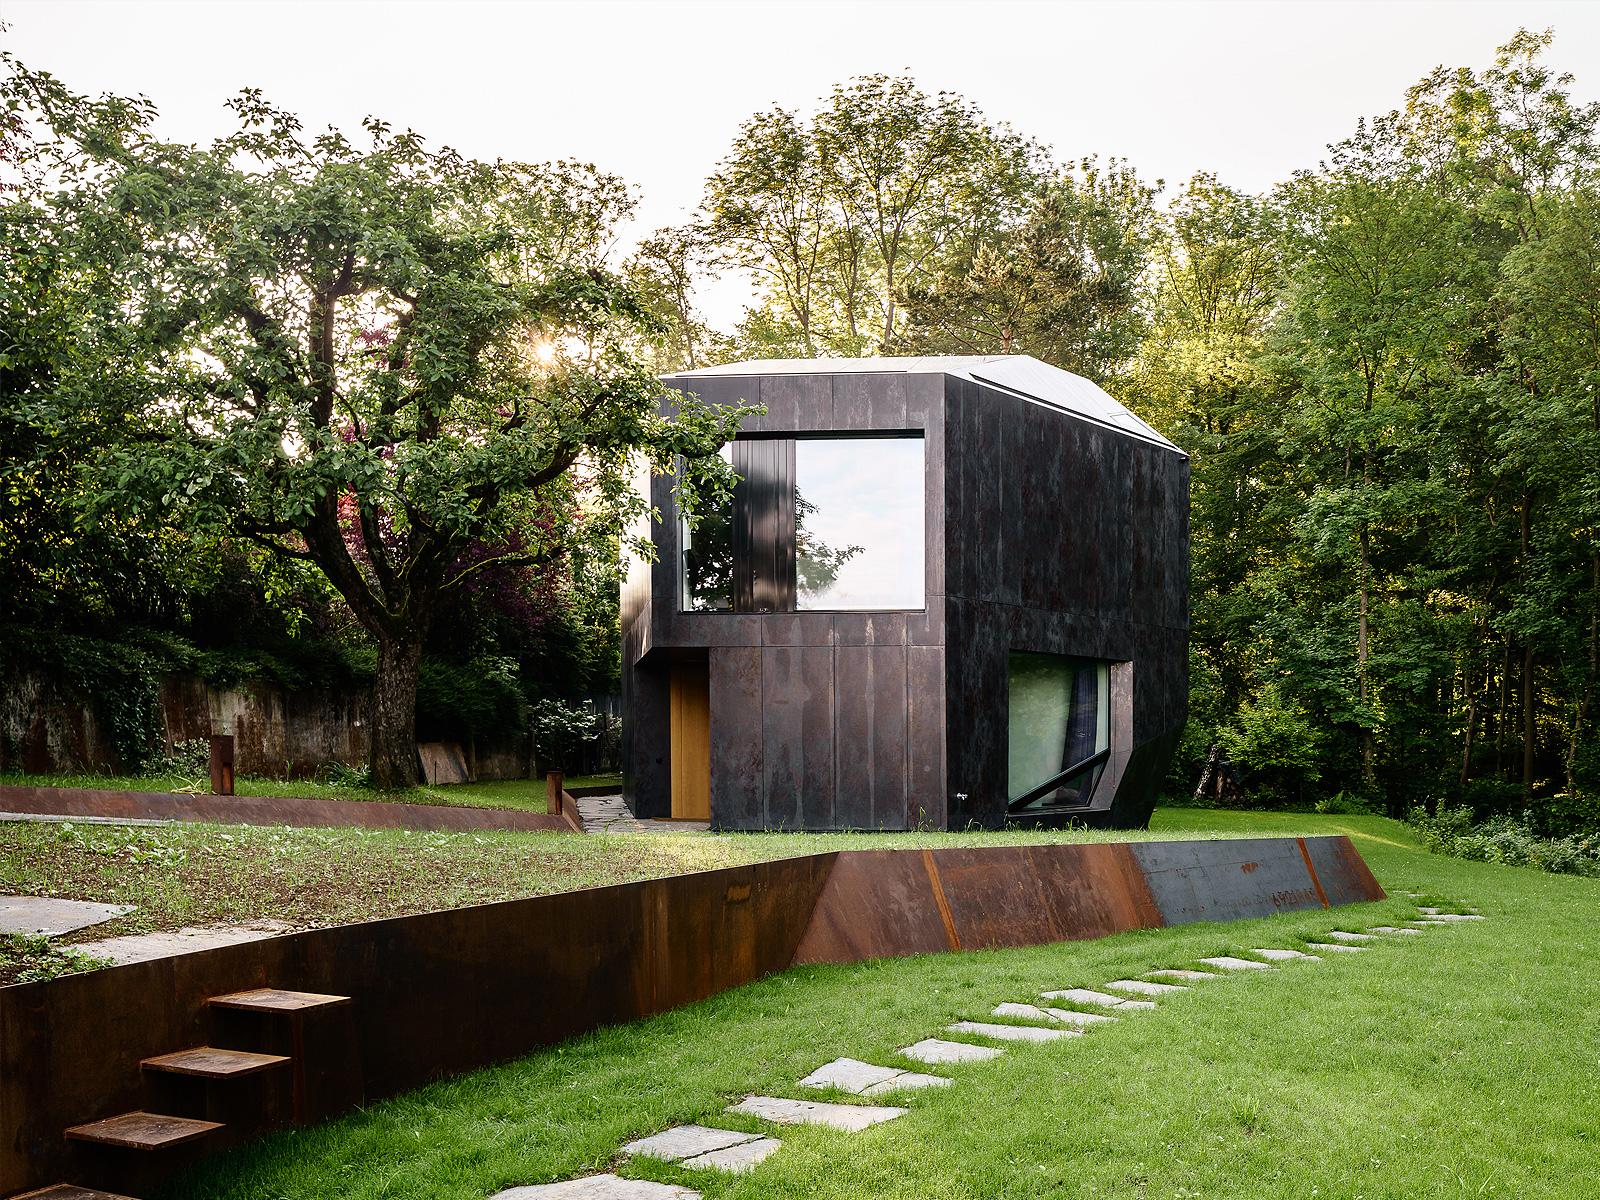 best architects architektur award daluz gonzalez architekten daluz gonzalez architekten. Black Bedroom Furniture Sets. Home Design Ideas